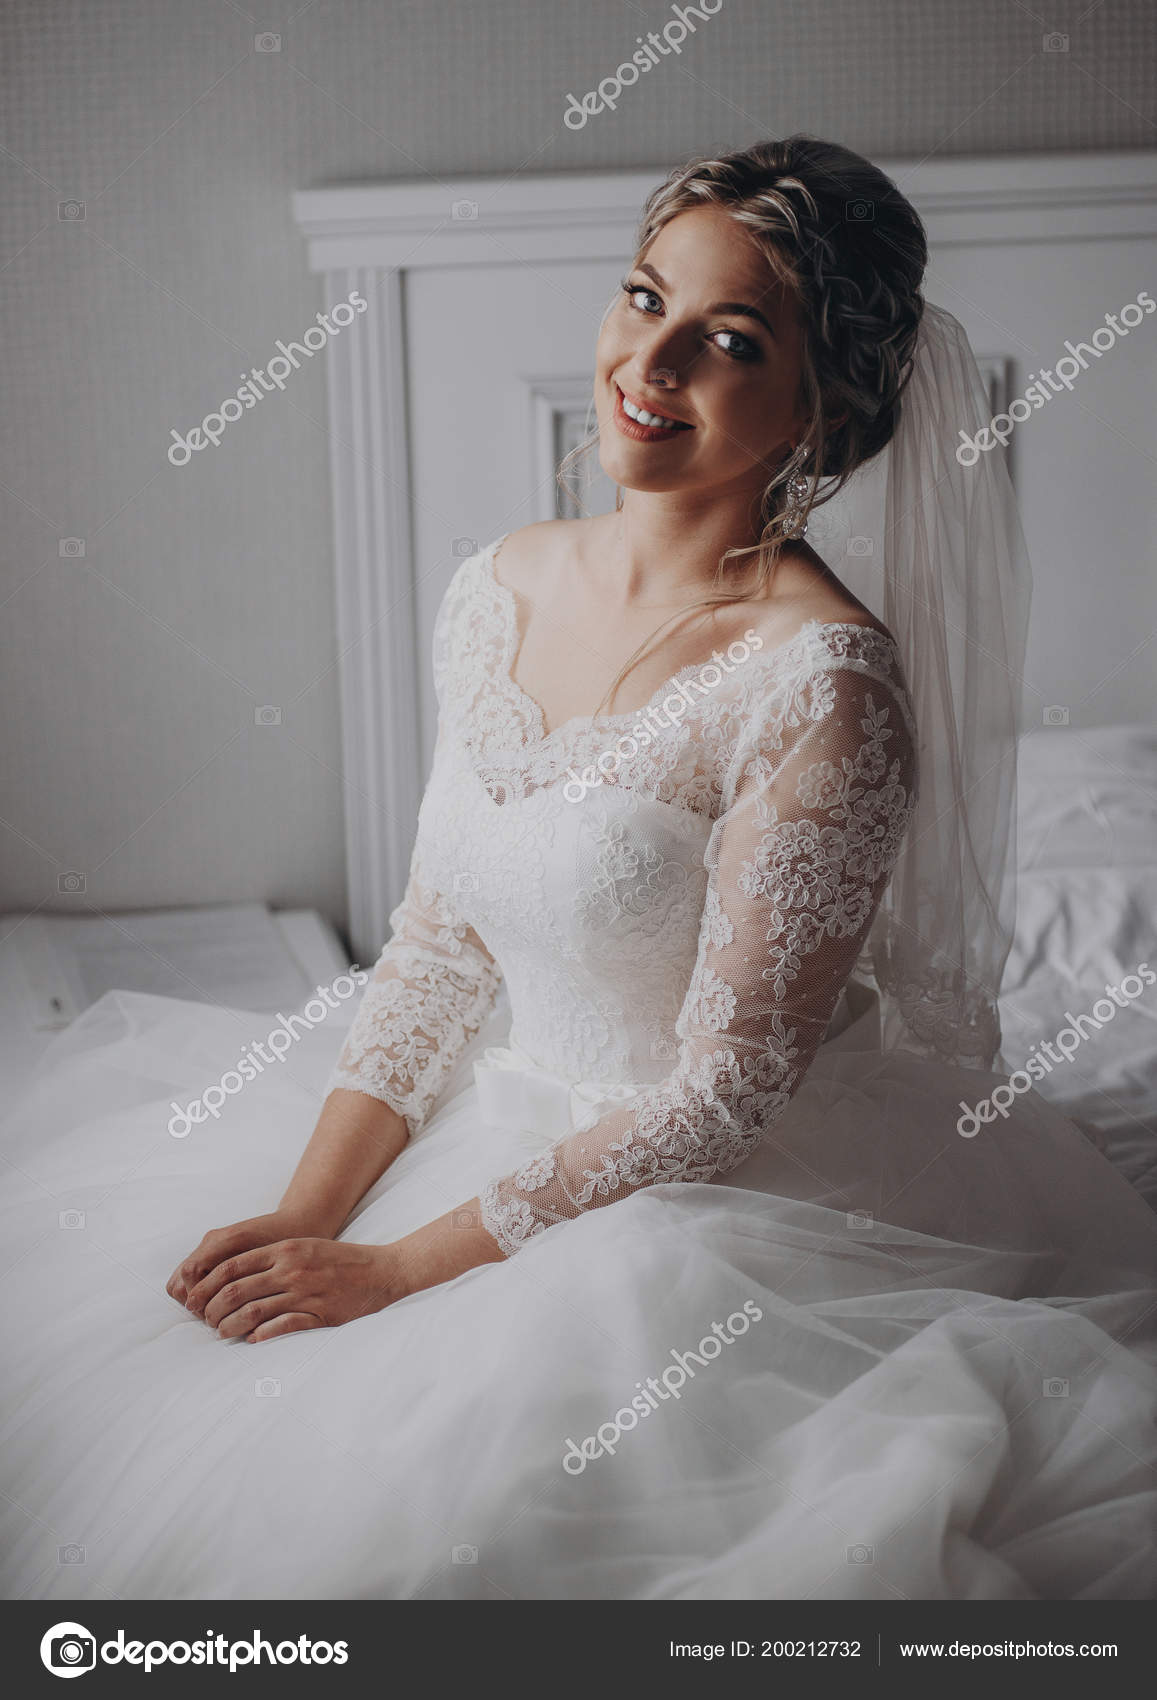 7a634b92b58 Μια Ωραία Νύφη Ρυθμίζει Σκουλαρίκι Όμορφη Νύφη Στο Δωμάτιο Πρωί ...